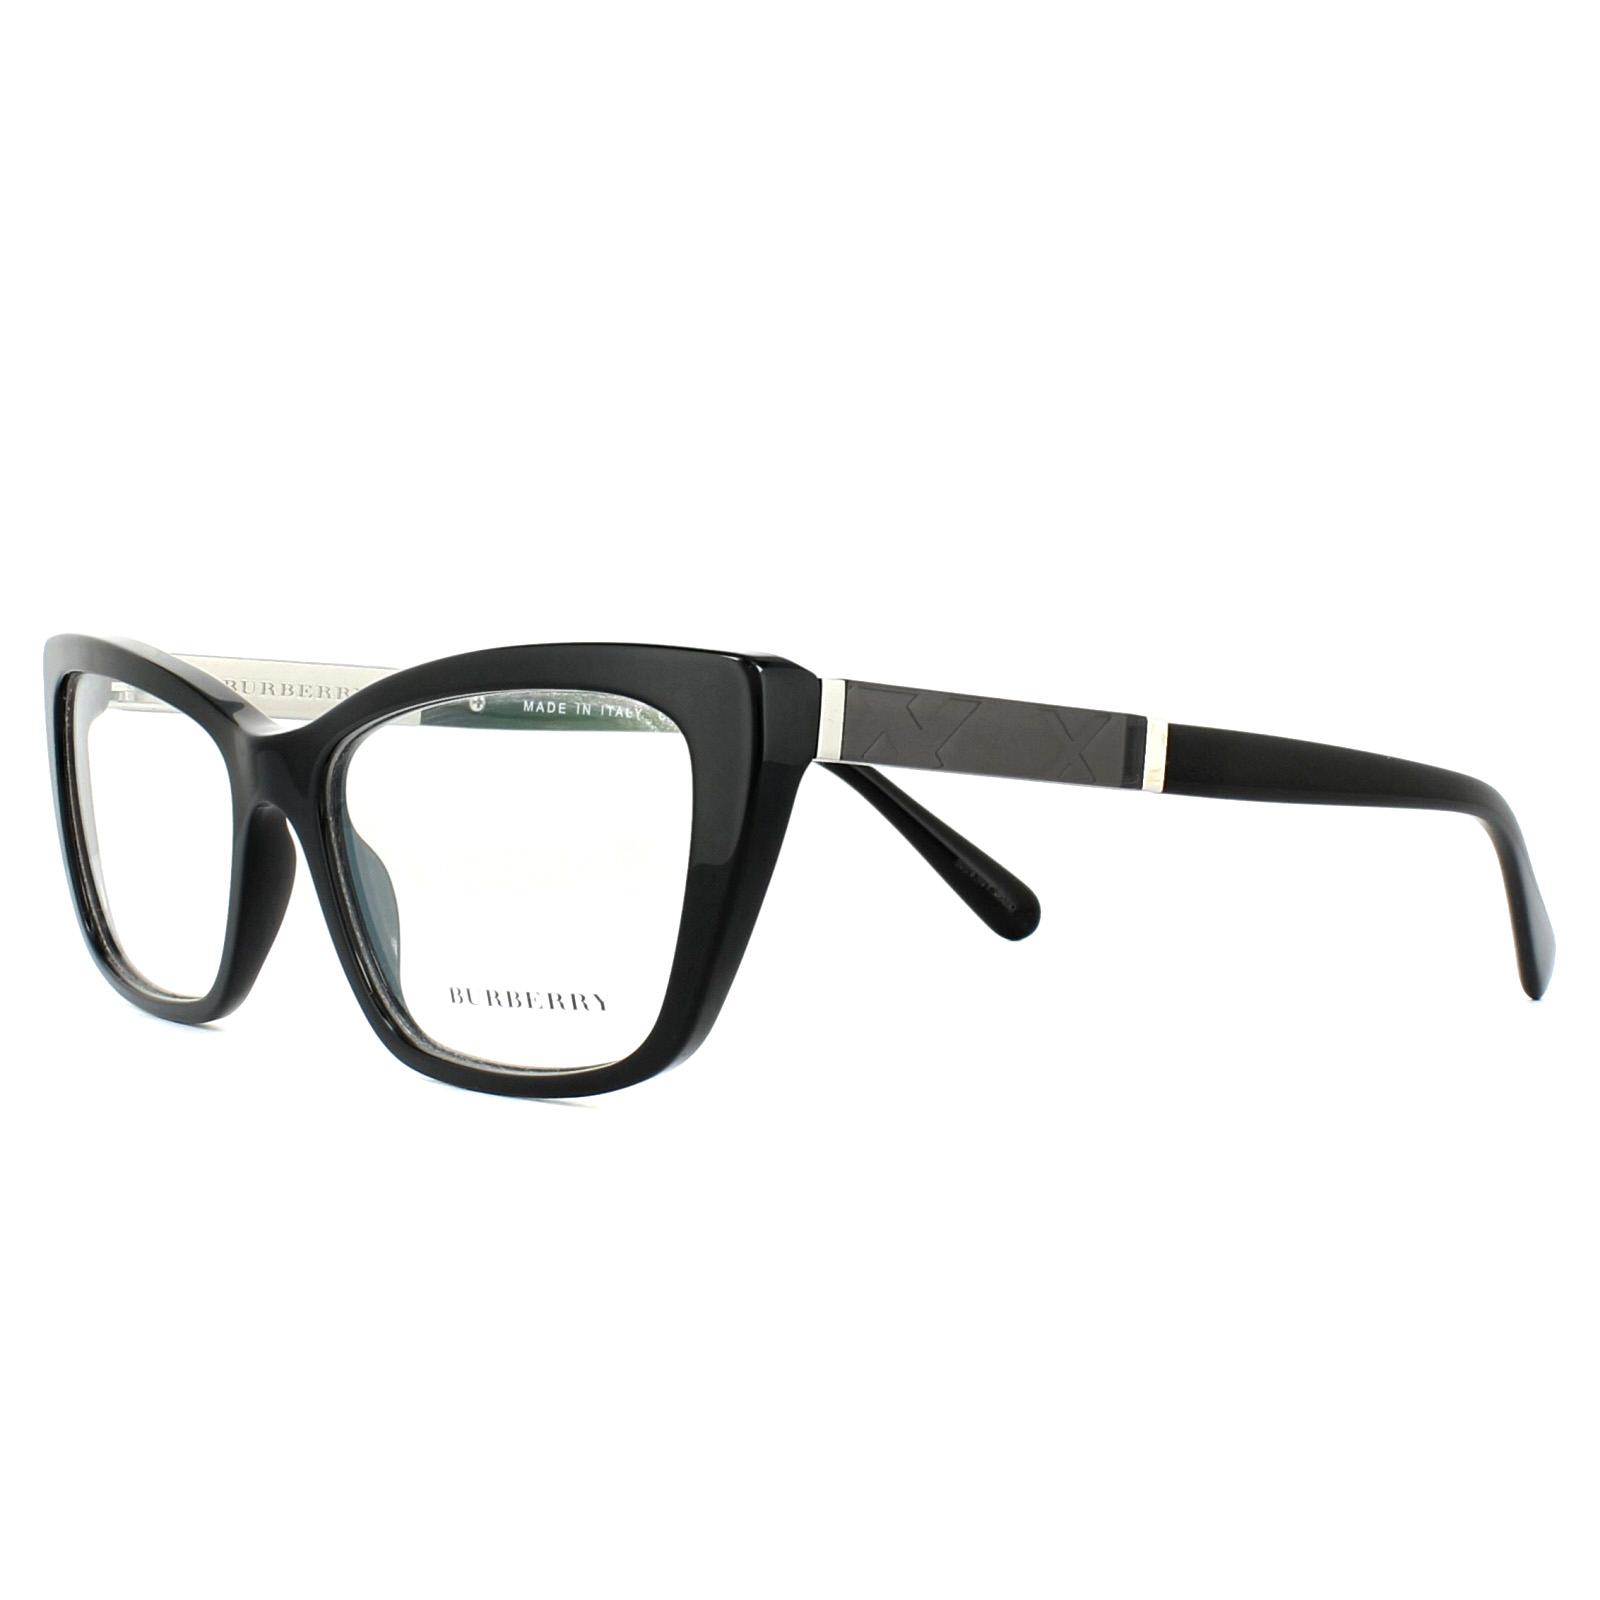 a26068724b5 Burberry Glasses Frames BE2236 3001 Black 54mm Womens 8053672592535 ...